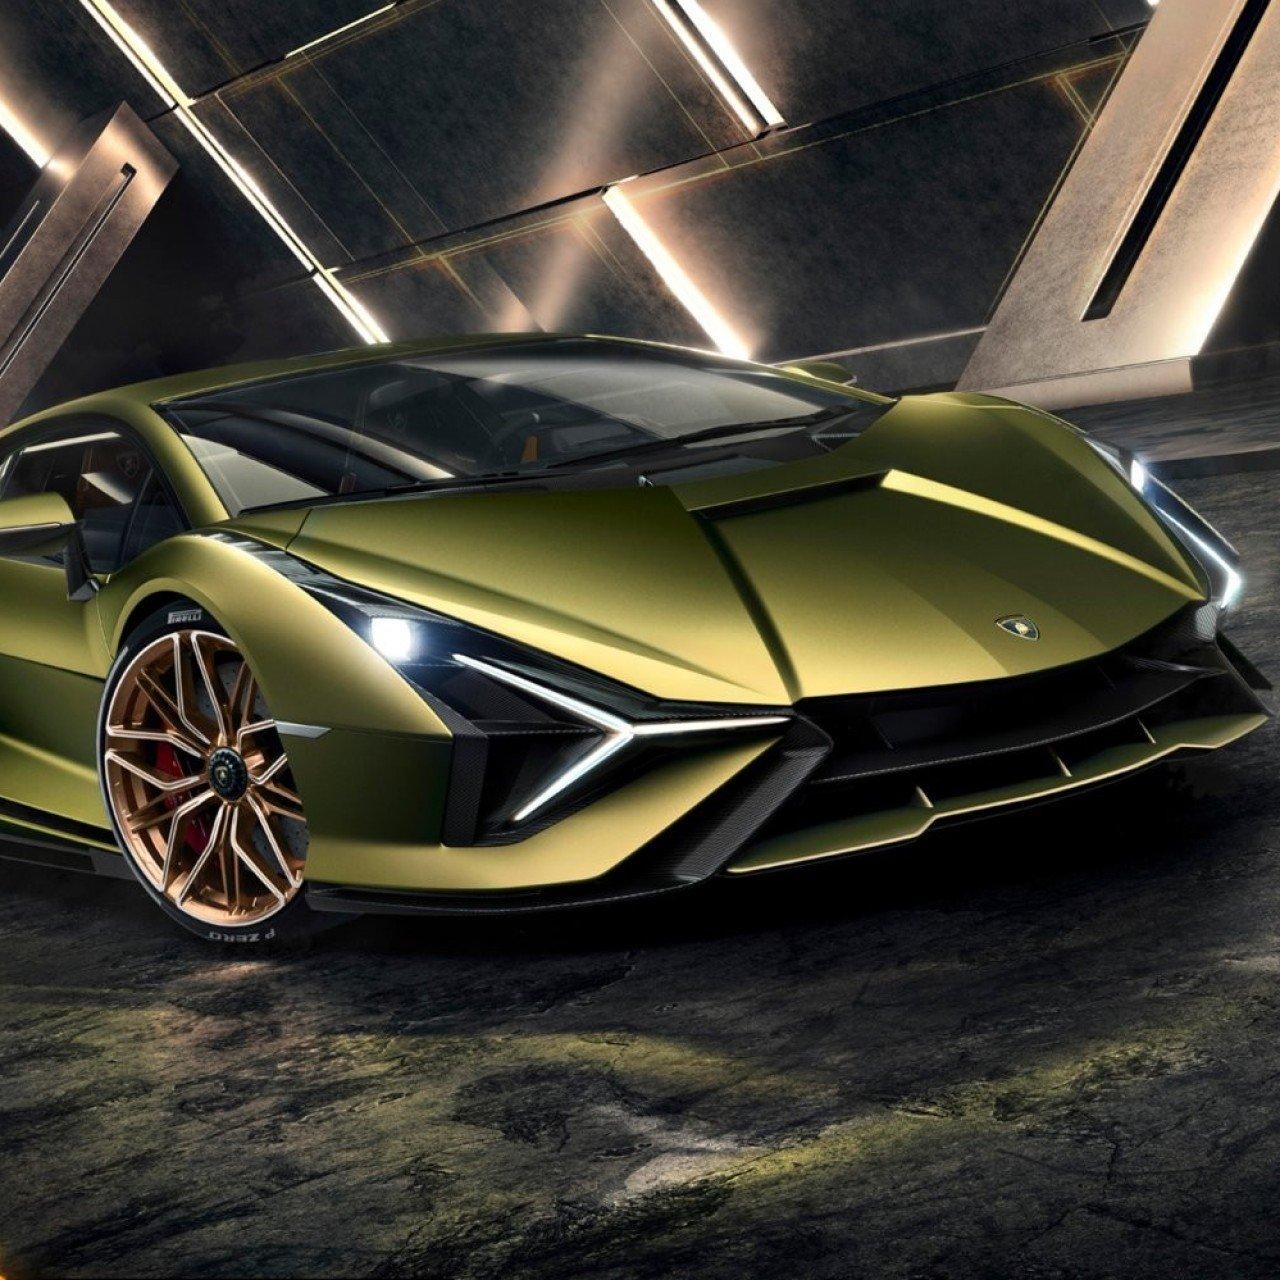 All 63 of Lamborghini's new $3 6 million Sian hybrid